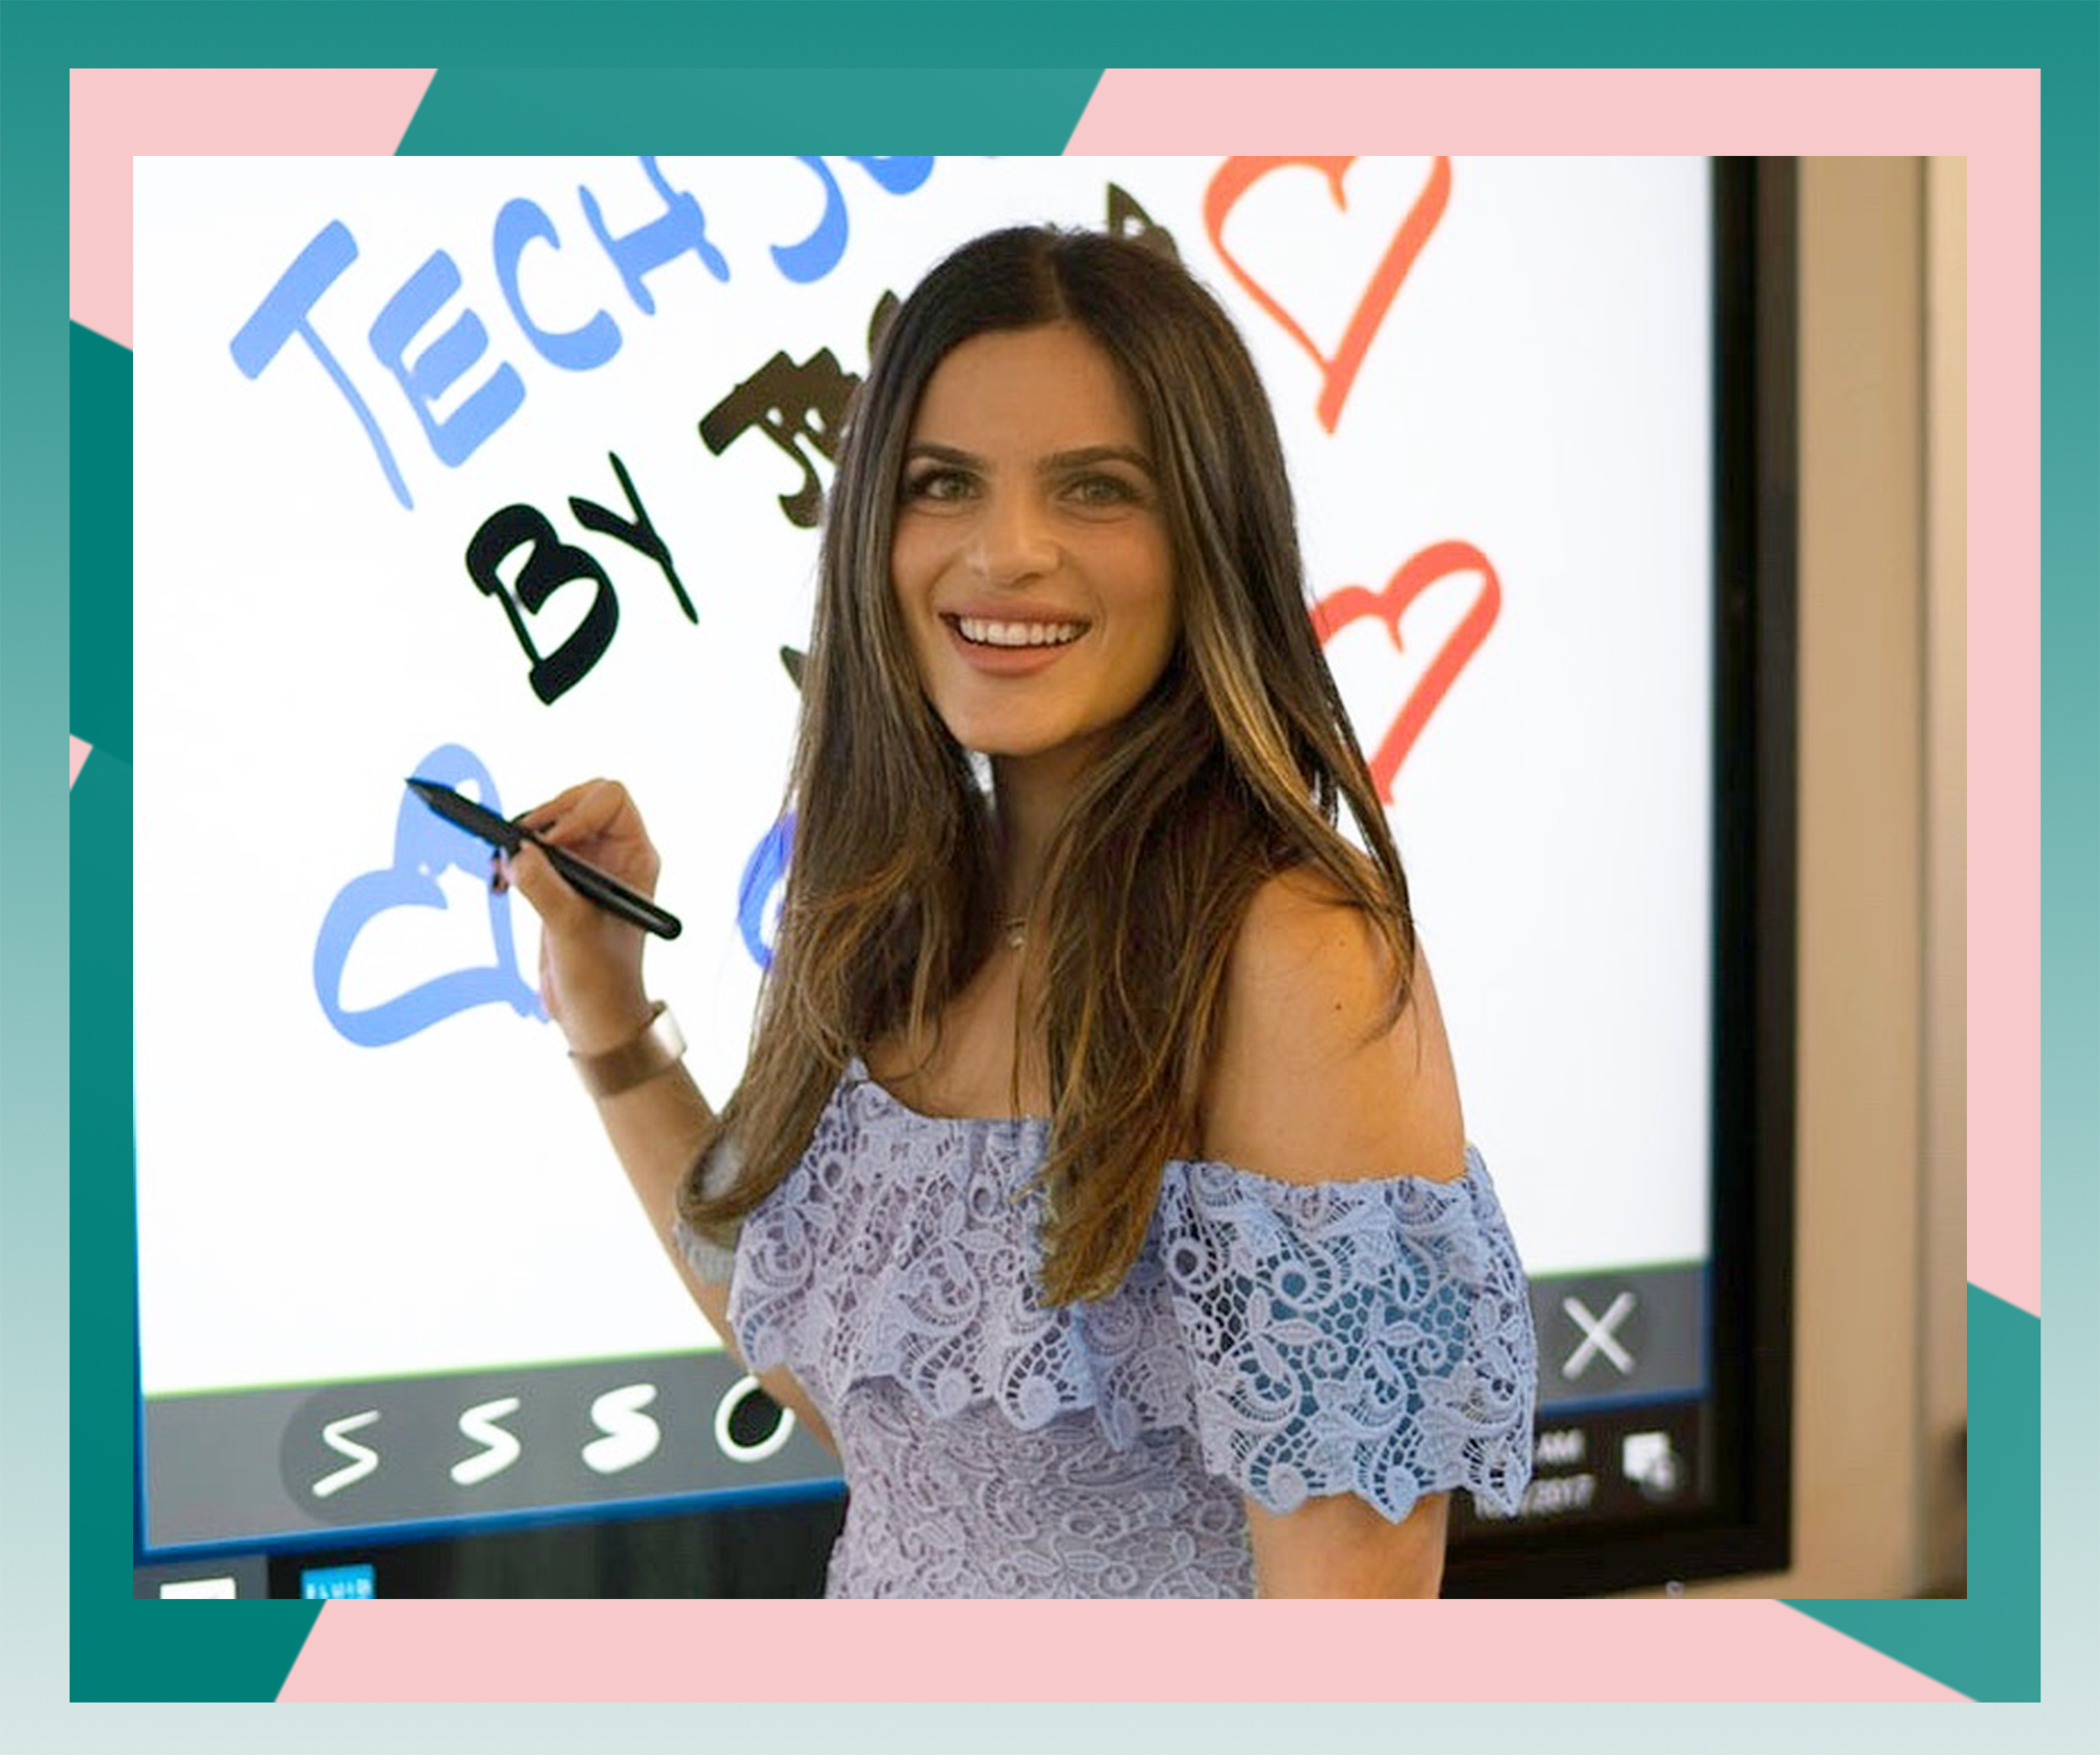 Tech Journalist Jessica Naziri Shares Her Favorite Wearables